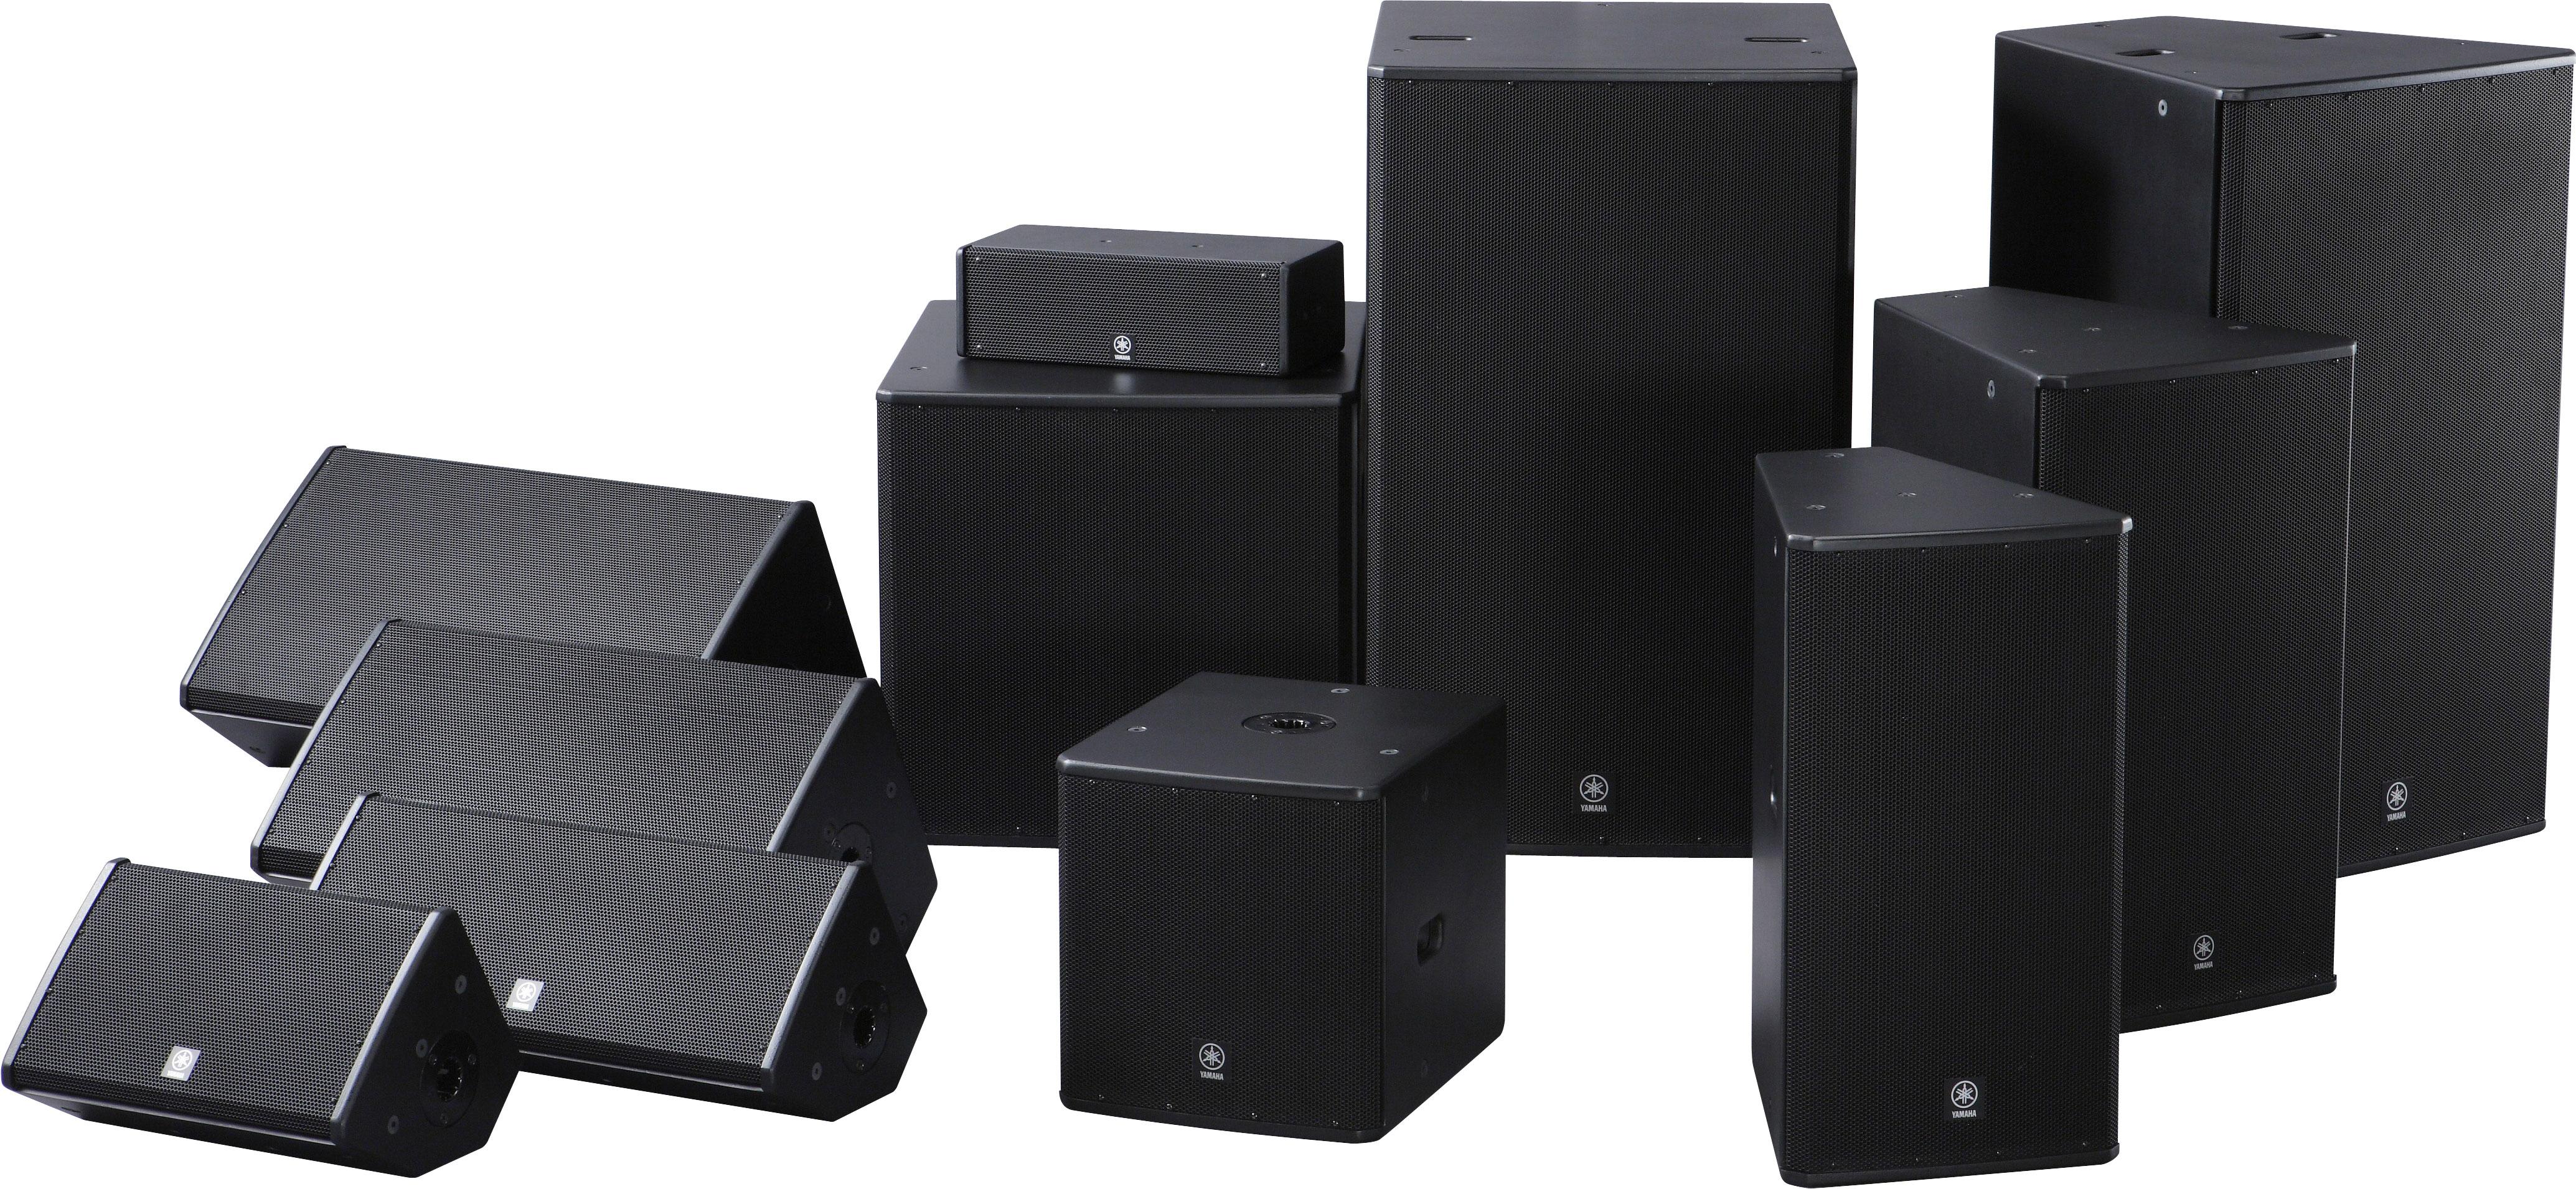 Loa Yamaha Installation Series